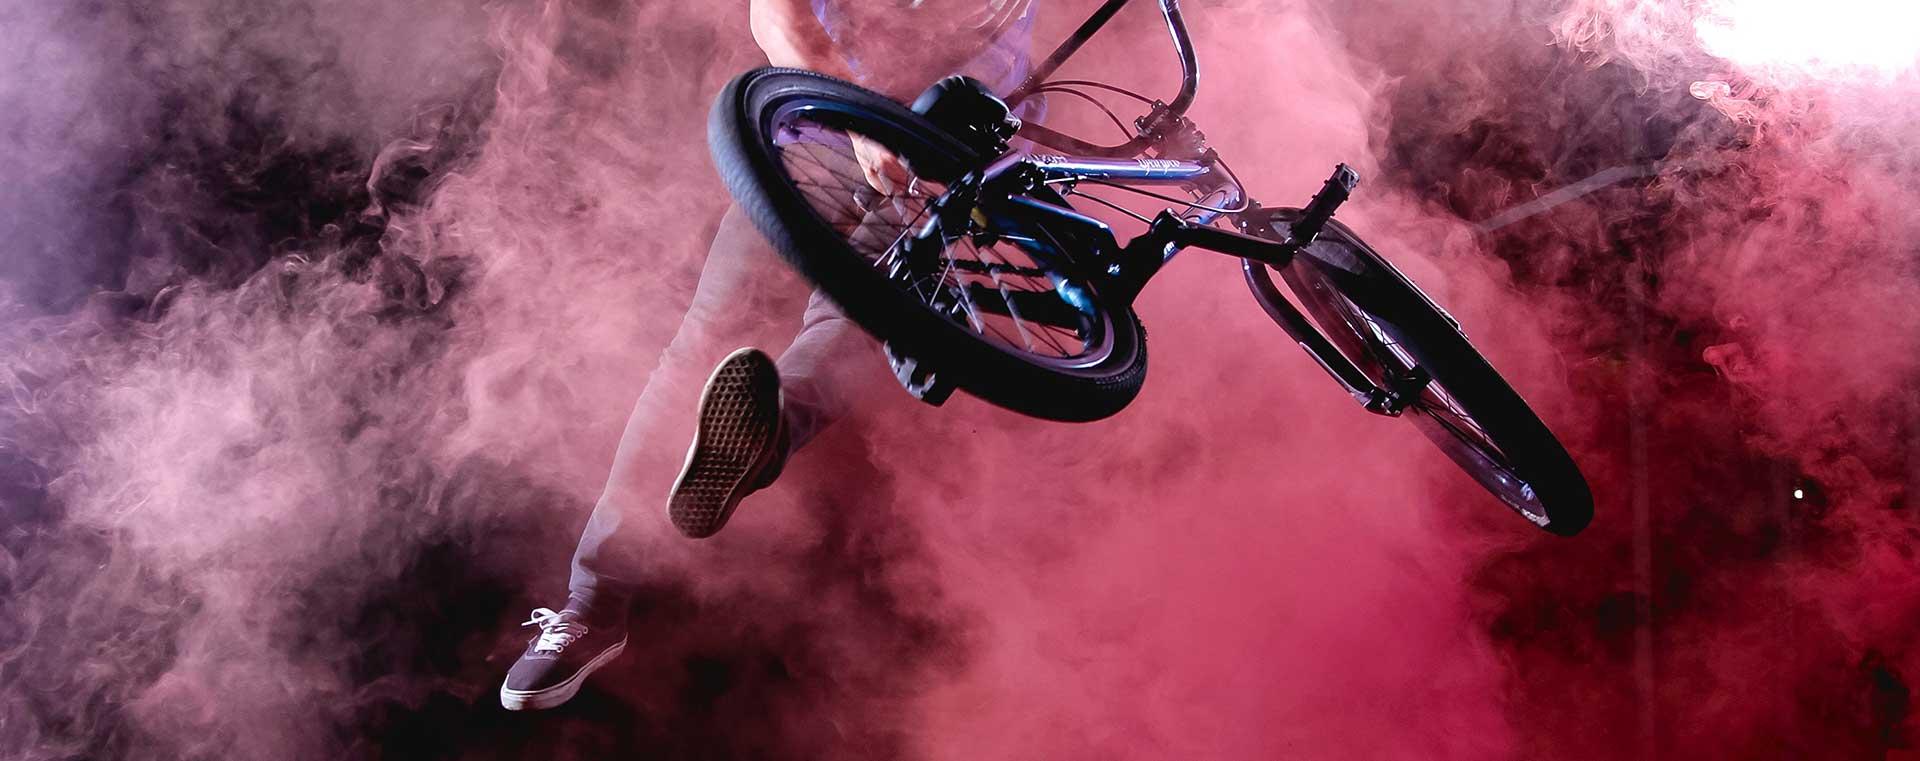 bmx-biker-jumping-flip-pink-smoke